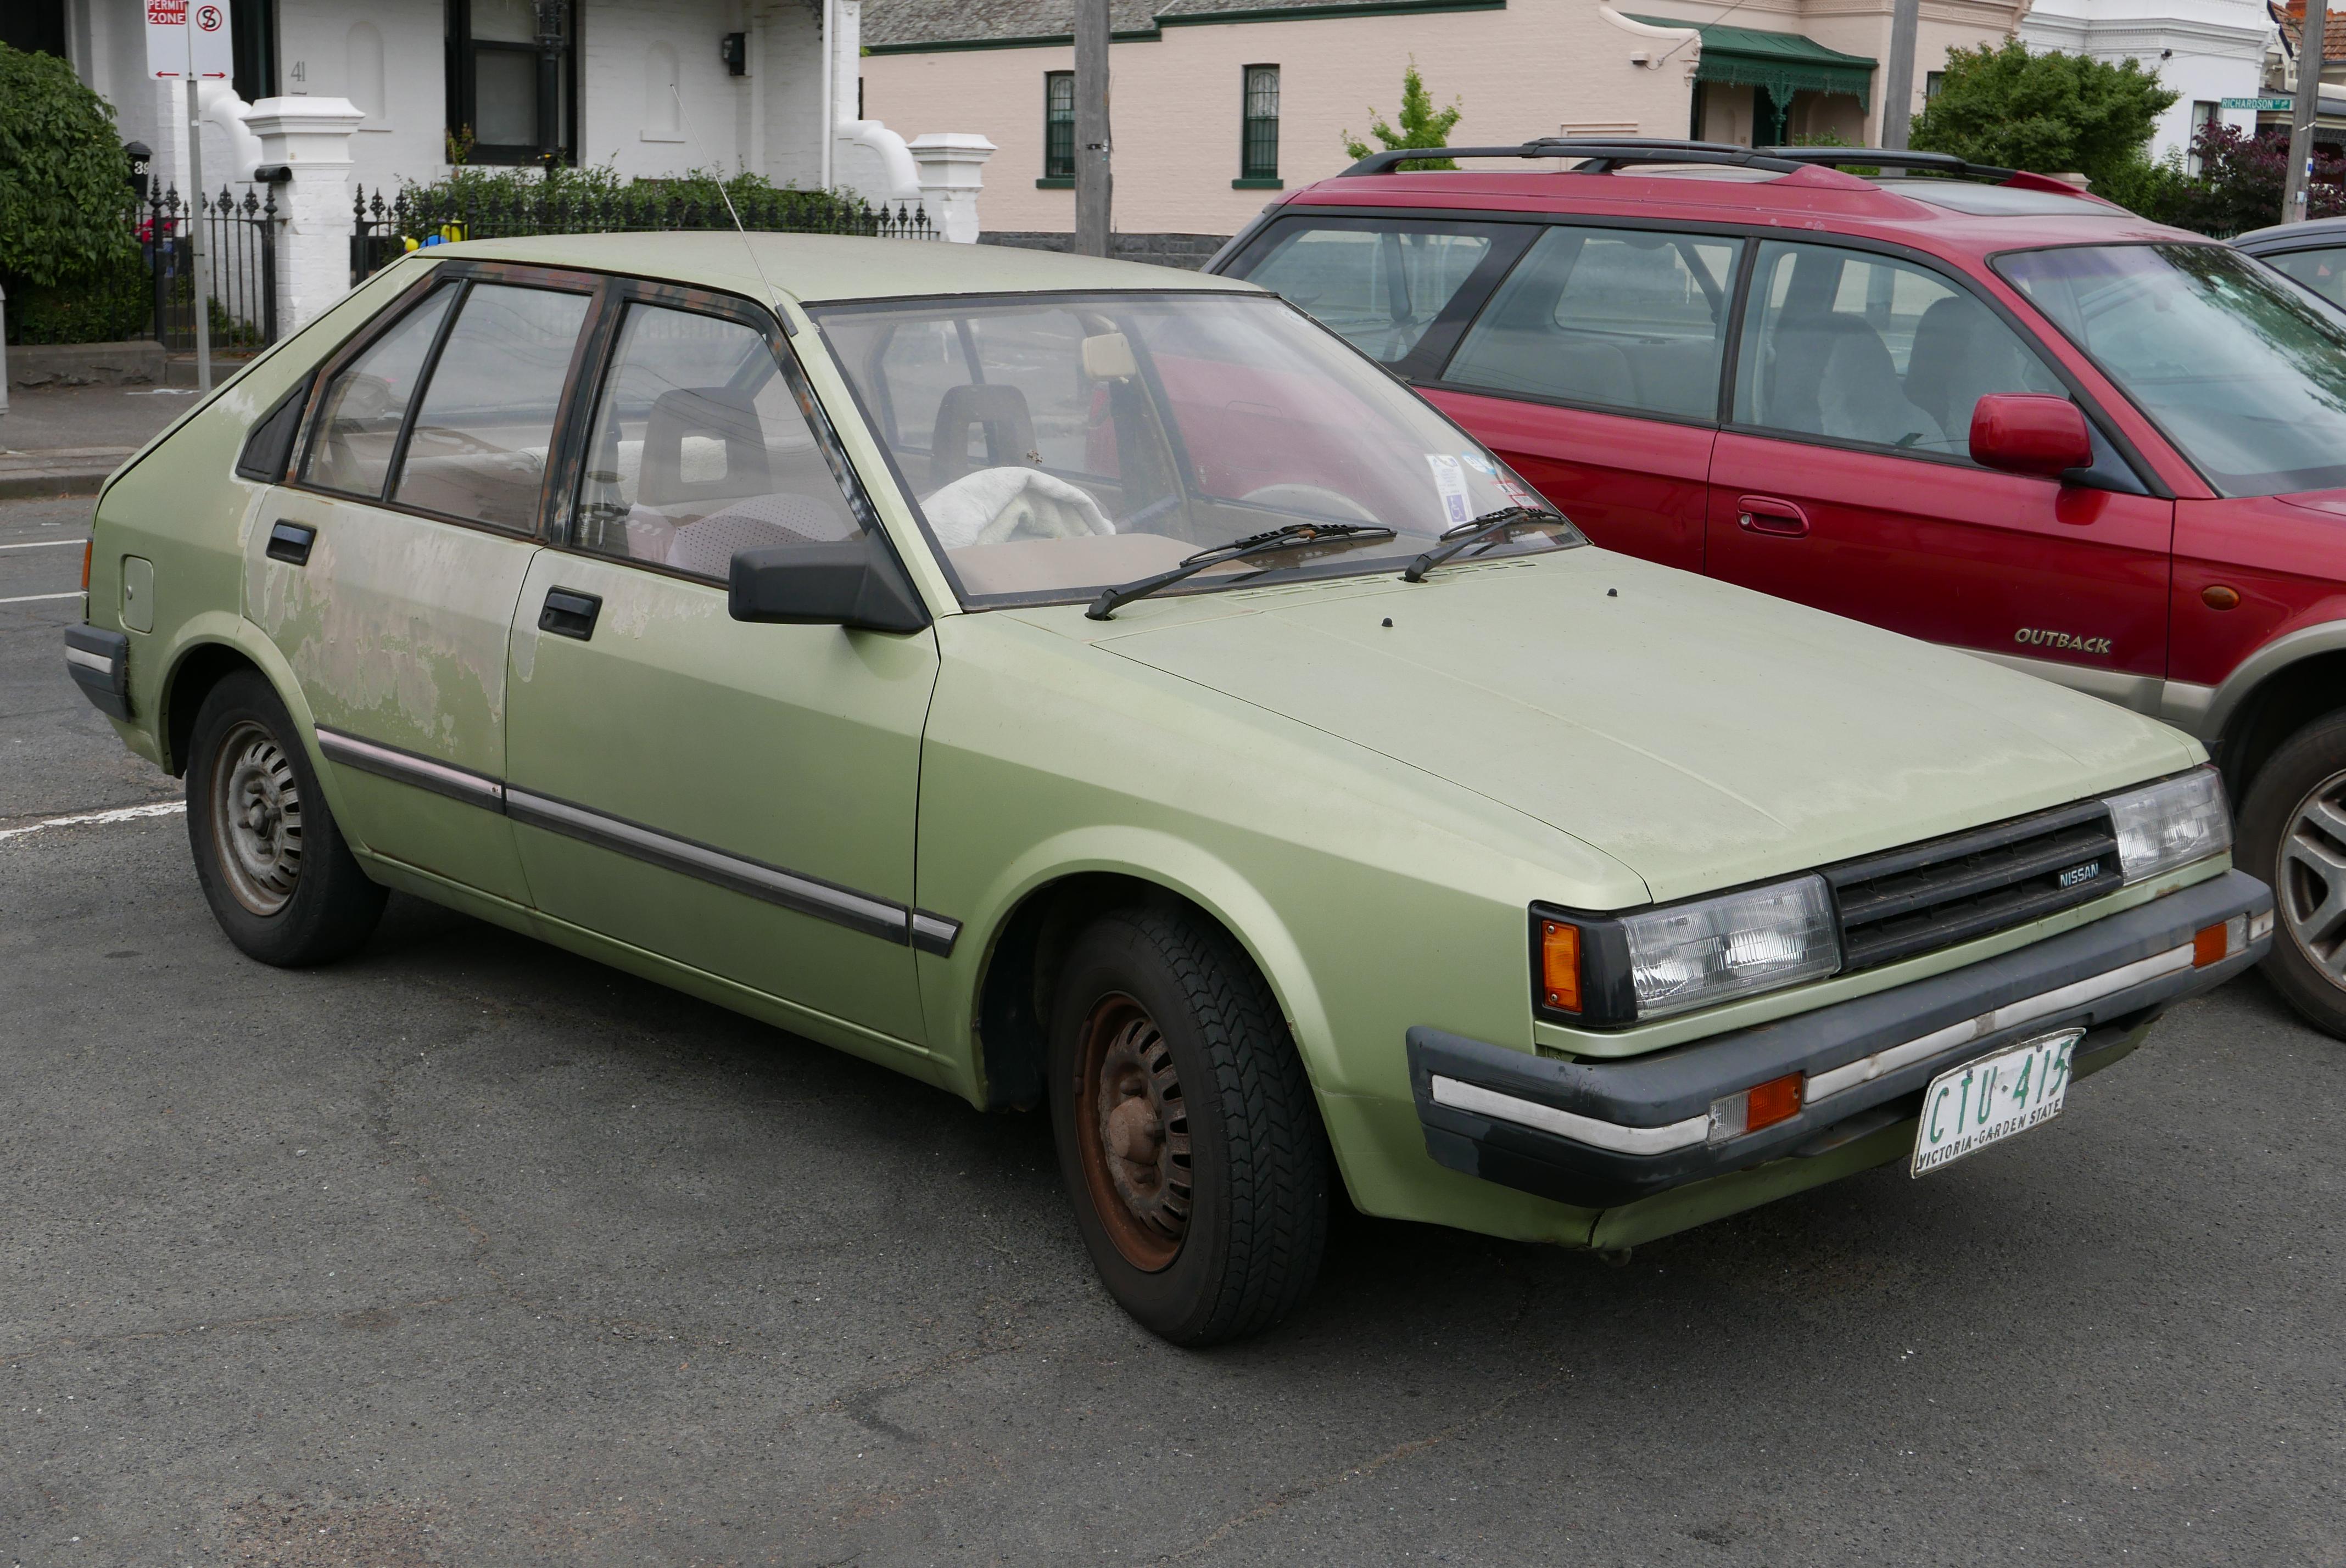 File:1986 Nissan Pulsar (N12 S3) GL 5-door hatchback (2015-12-07) 01